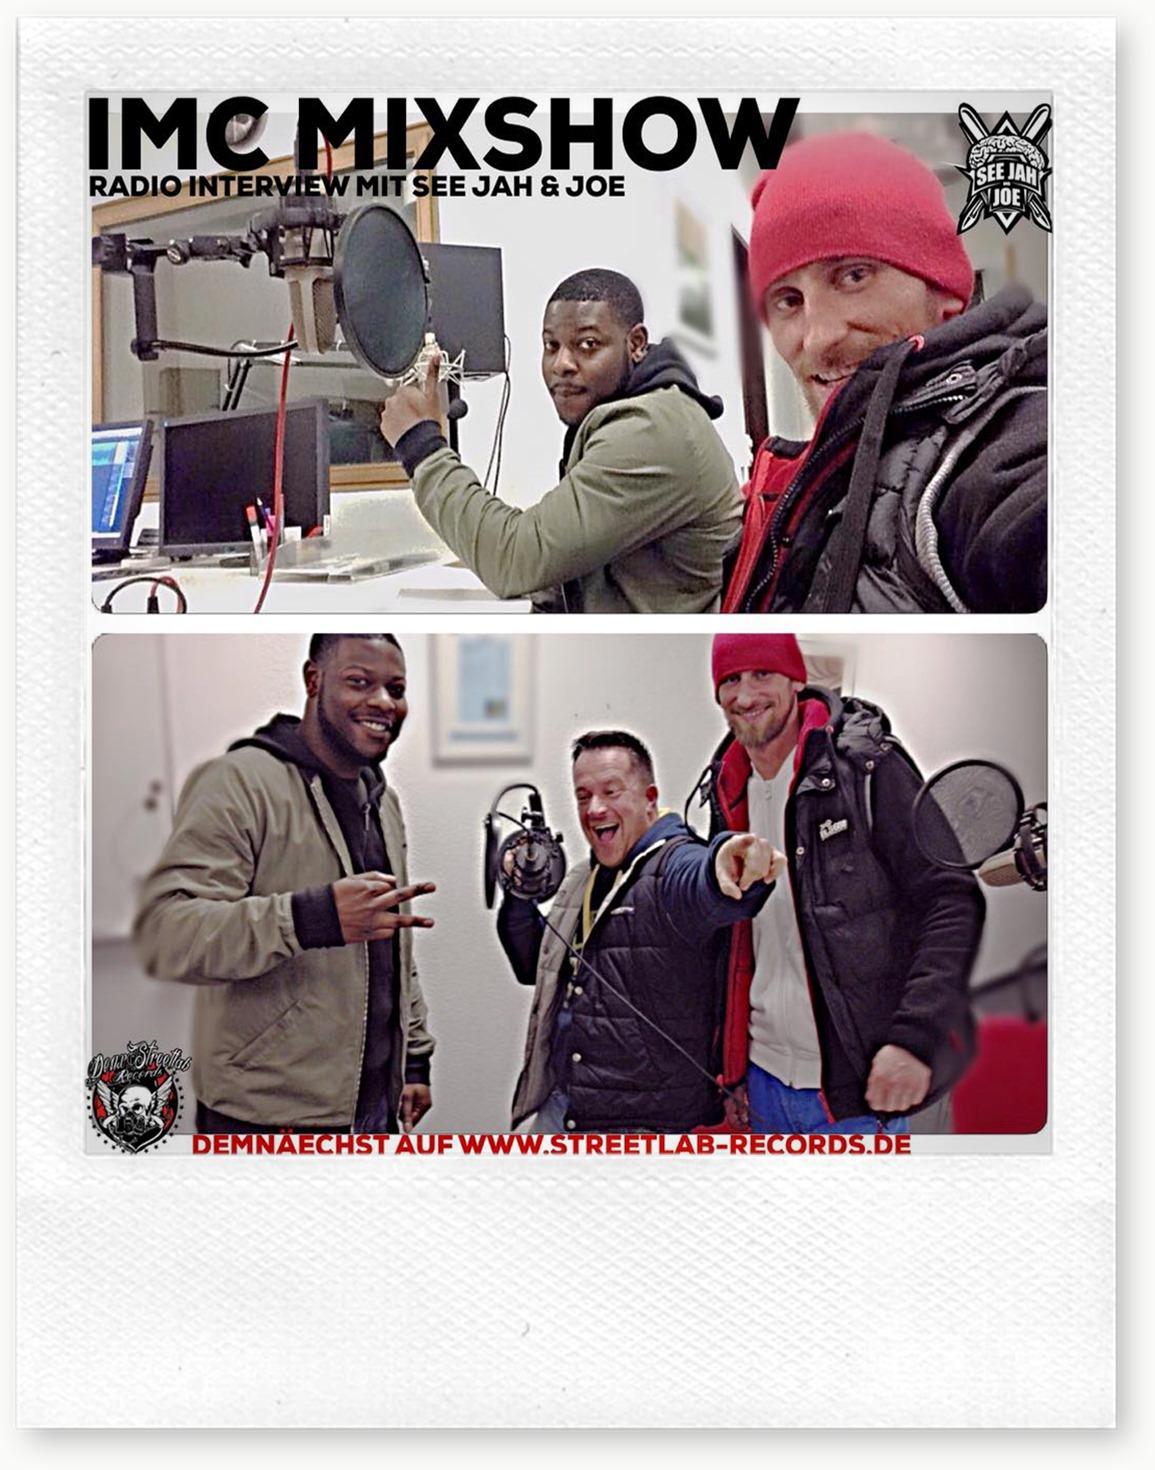 IMC Mixshow 1603 mit See Jah & Joe (Flyer)